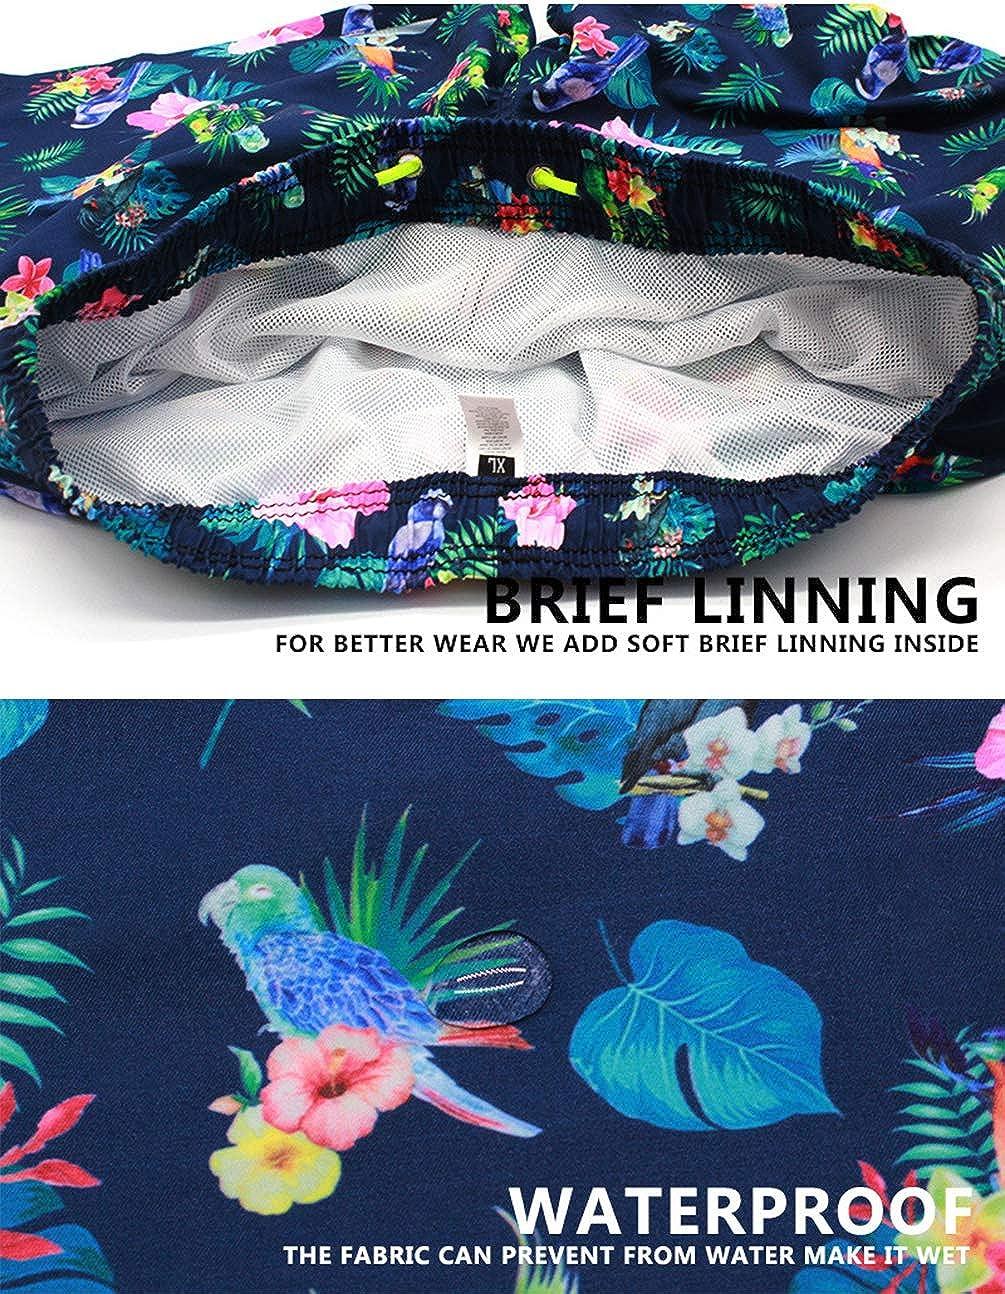 YuanDian Uomo Estate Stampa Bermuda Mare Short da Bagno Calzoncini Loose Fit Traspirante Asciugatura Rapida Impermeabile Surf Pantaloncini Costumi da Bagno Shorts